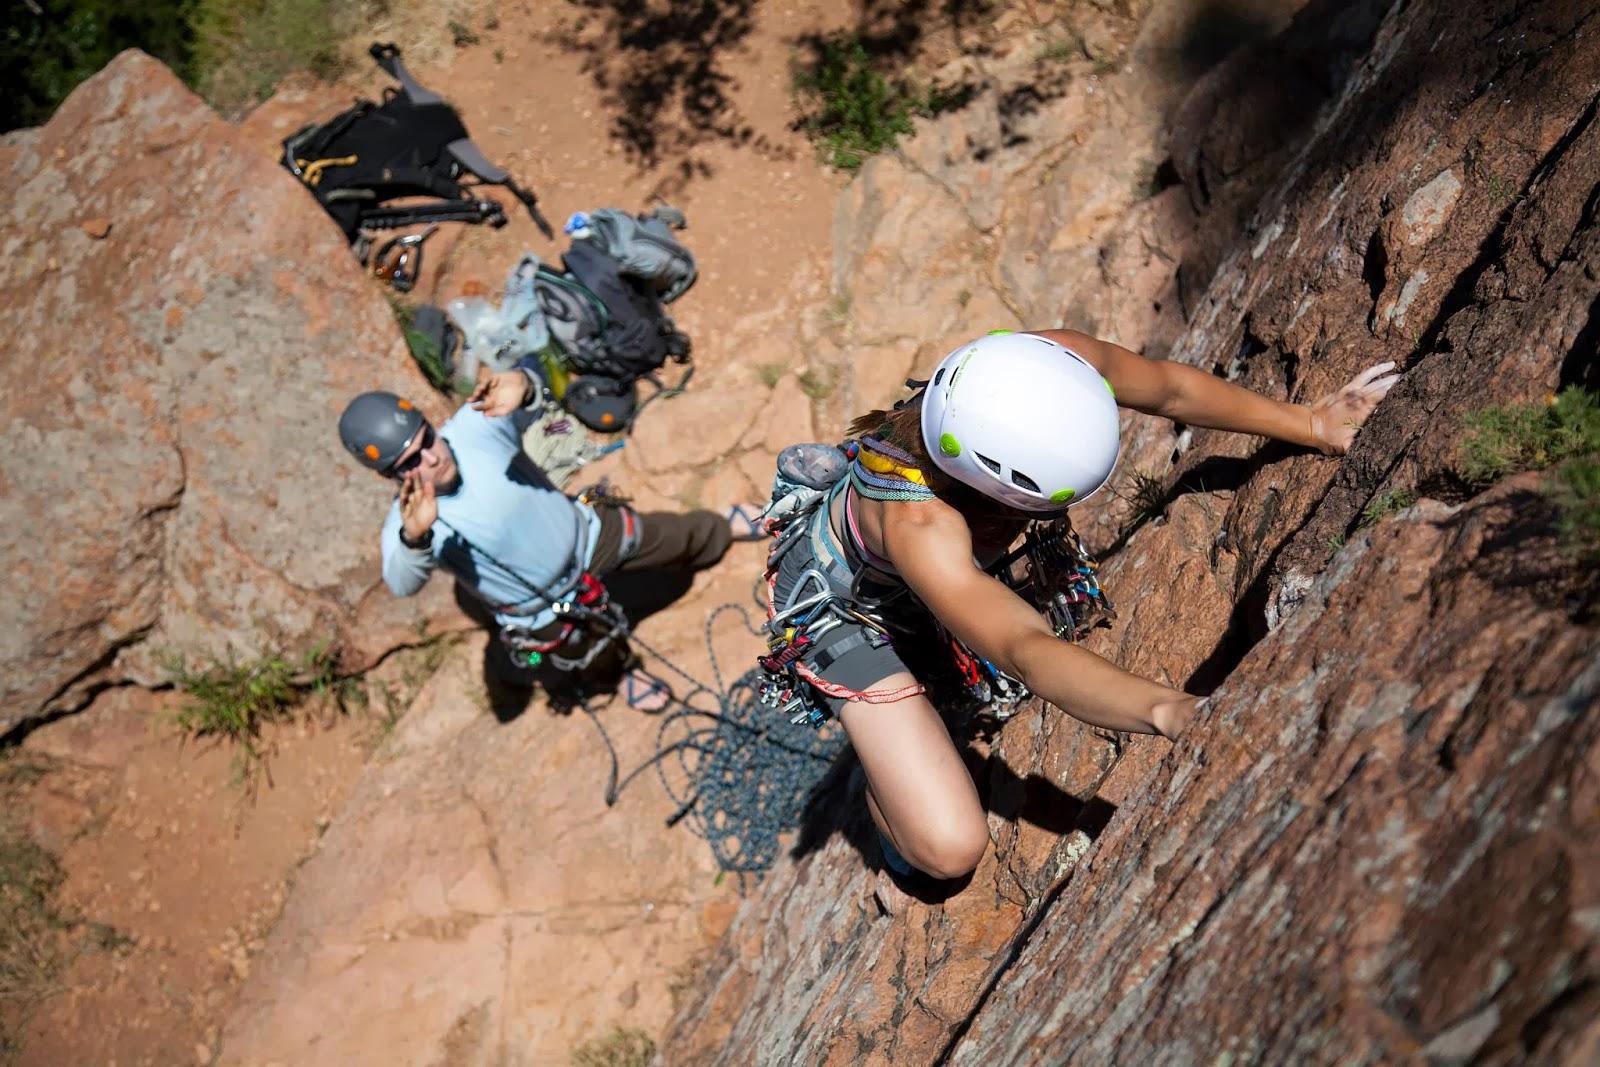 094c3e3b4dd Safety While Climbing and Climber Accountability